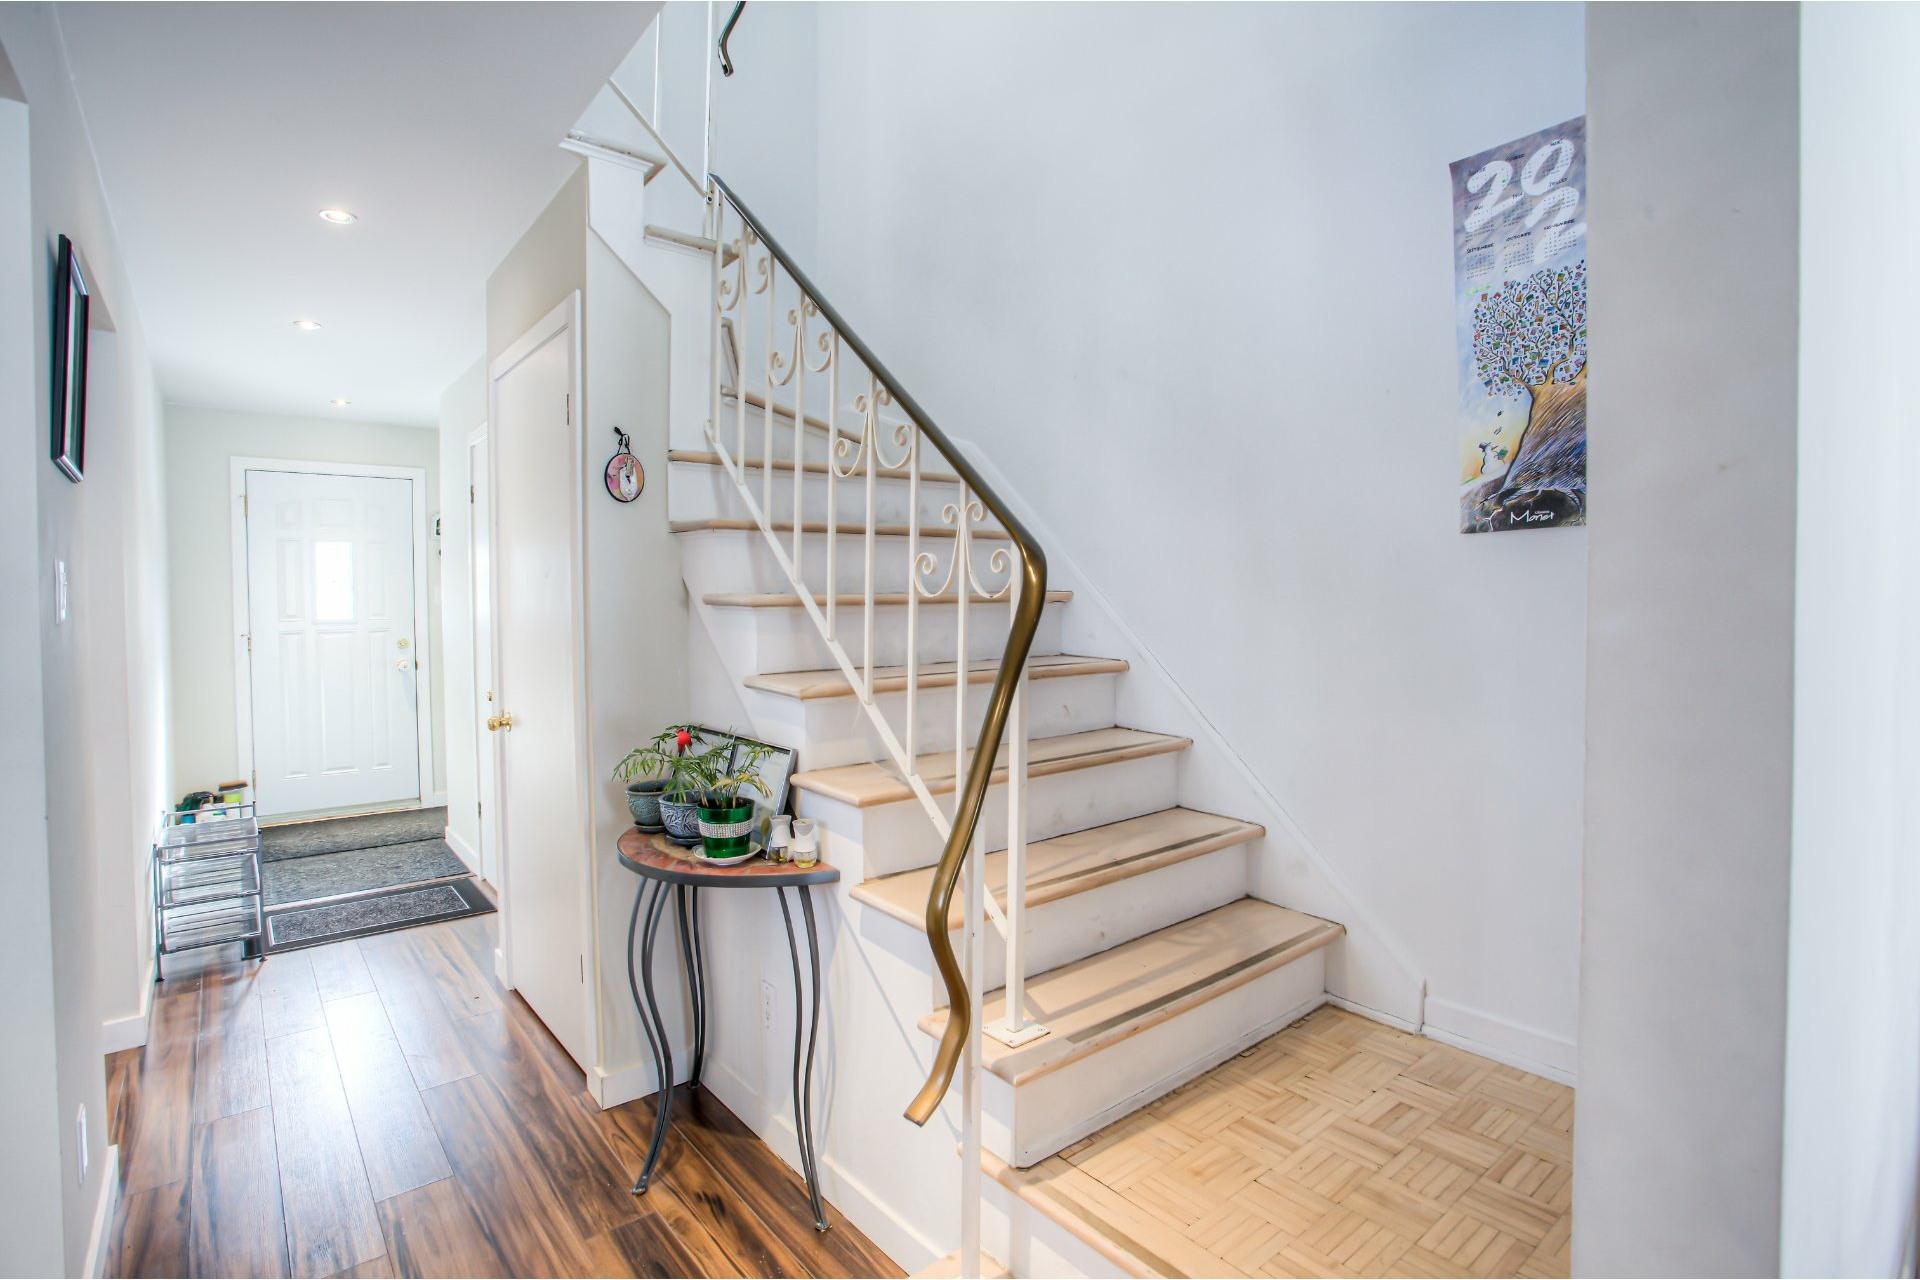 image 3 - House For rent Pierrefonds-Roxboro Montréal  - 9 rooms